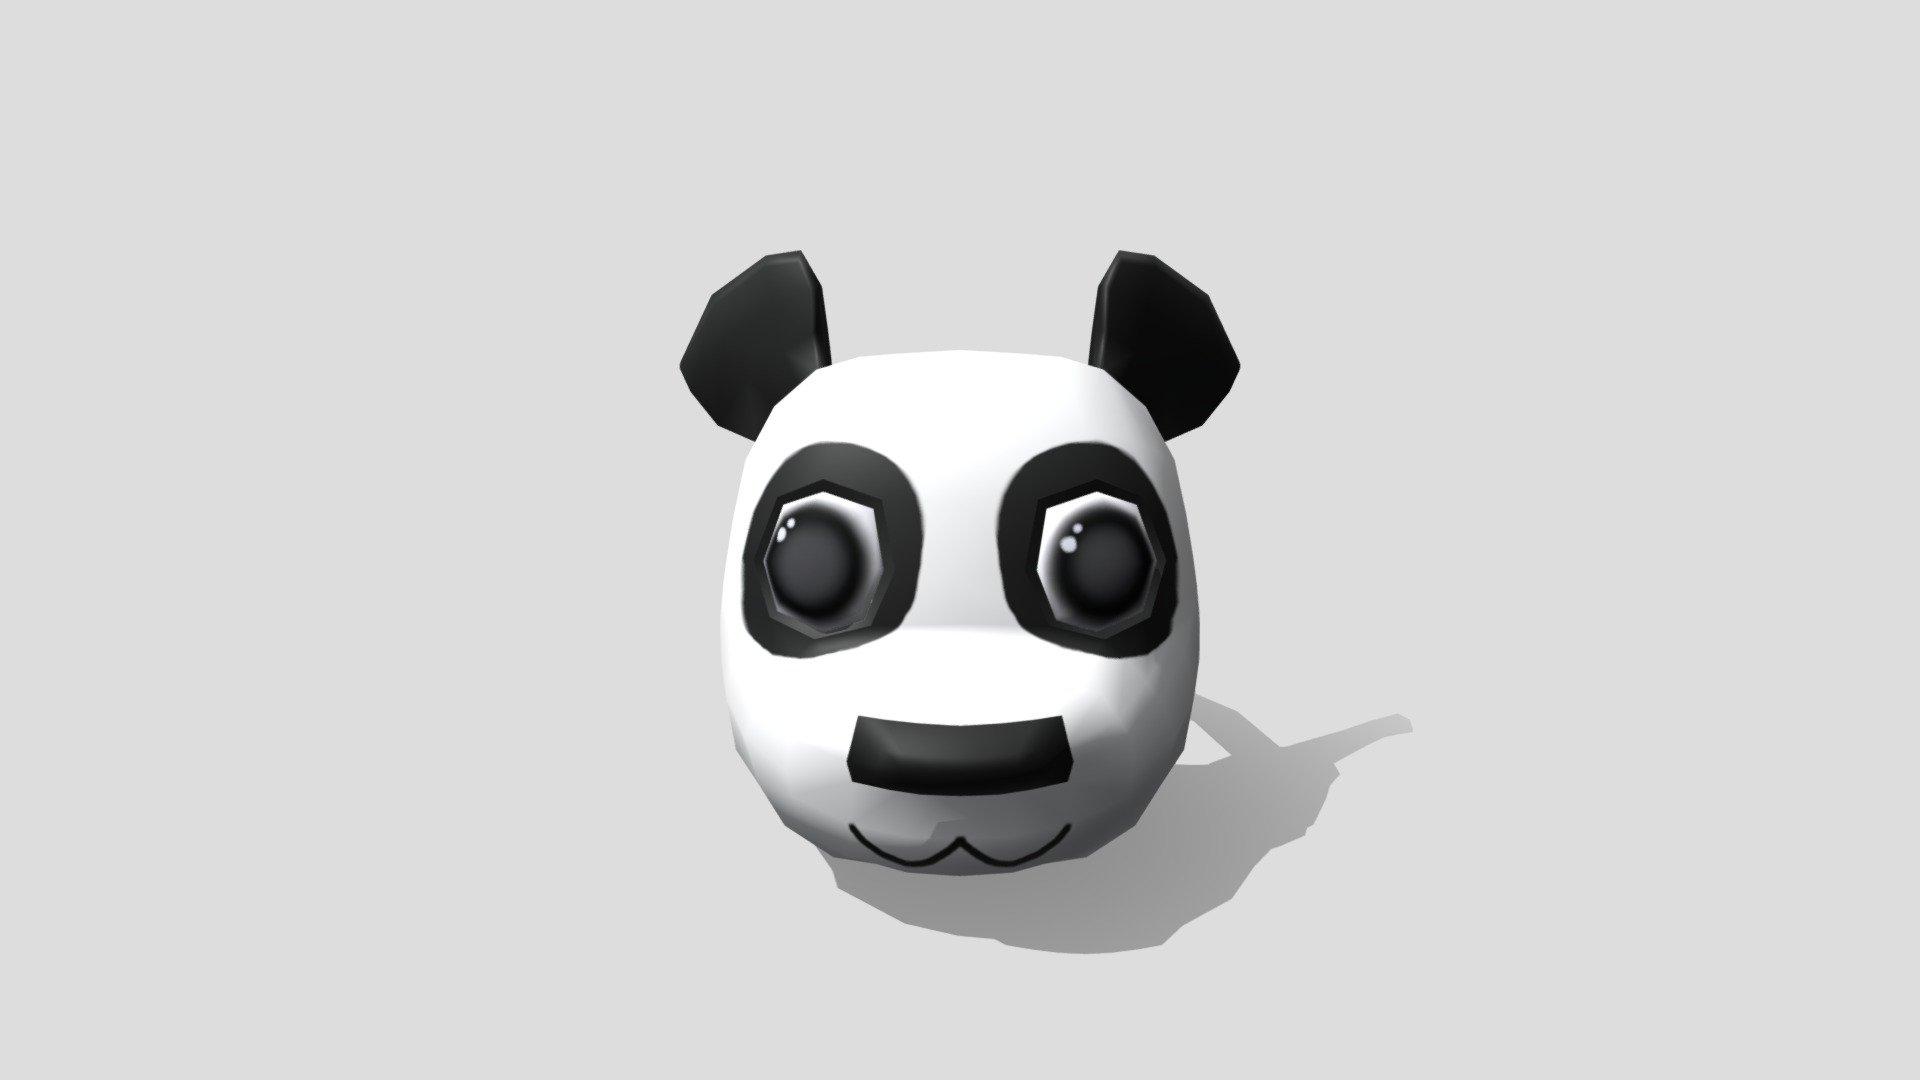 Roblox Panda Mask Concept 3d Model By Hiskell Savannah